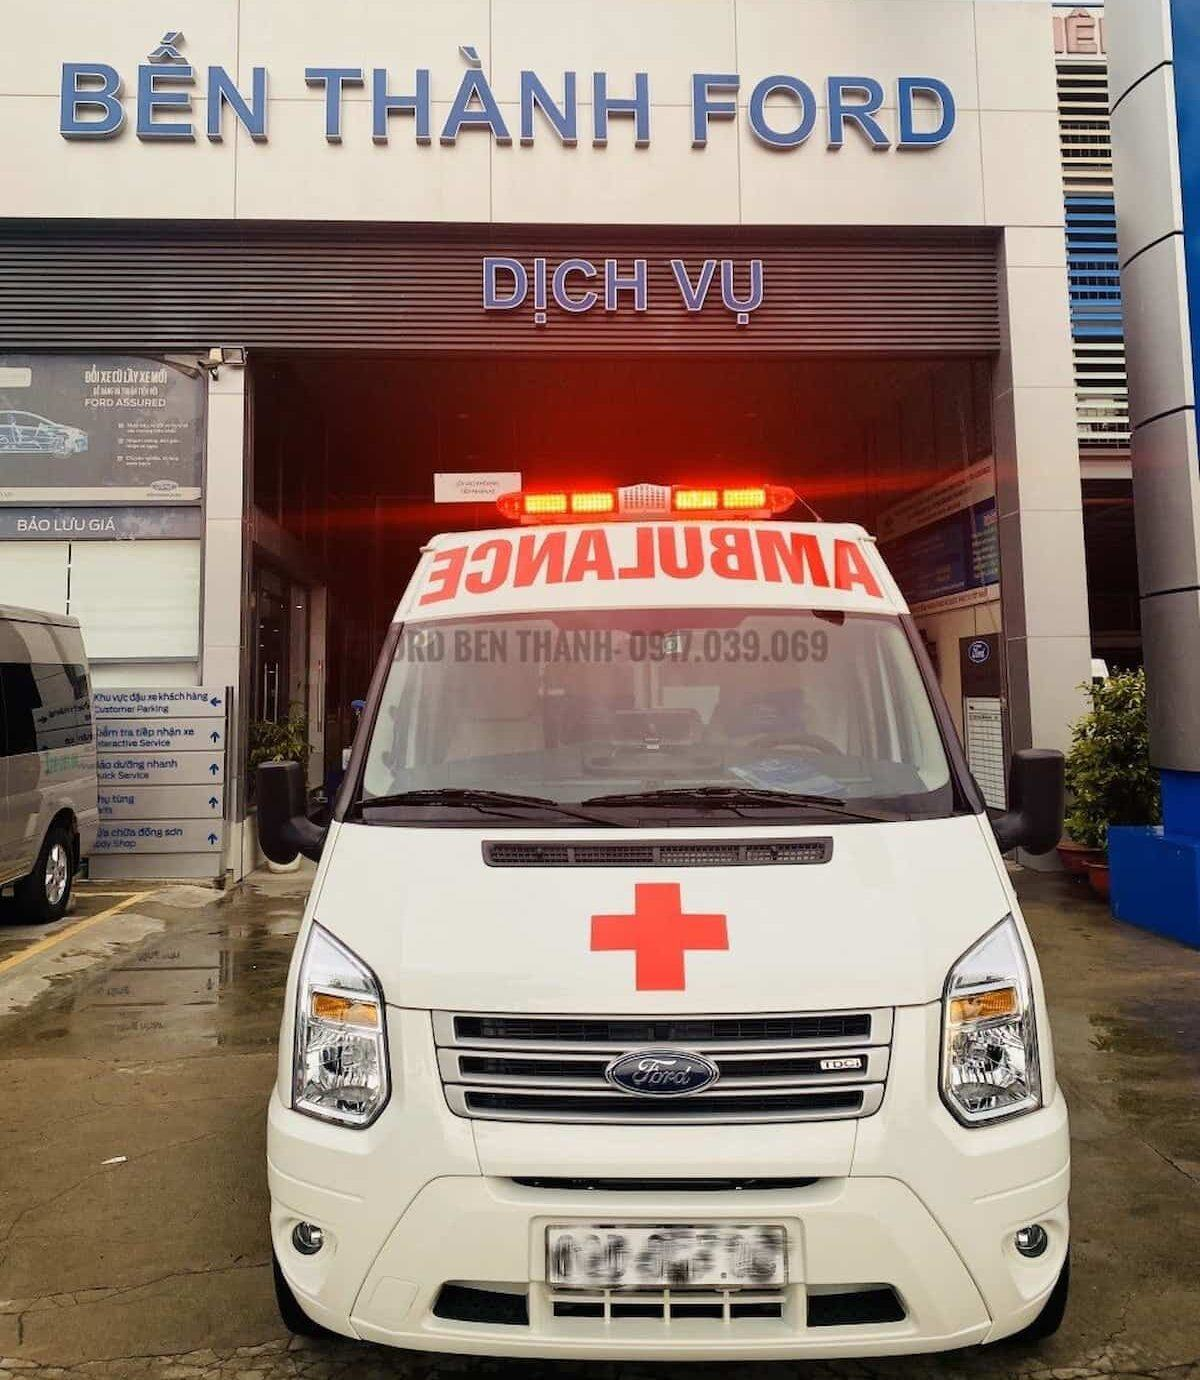 https://ford-benthanh.com/xe-cuu-thuong-ford-transit-chinh-hang/